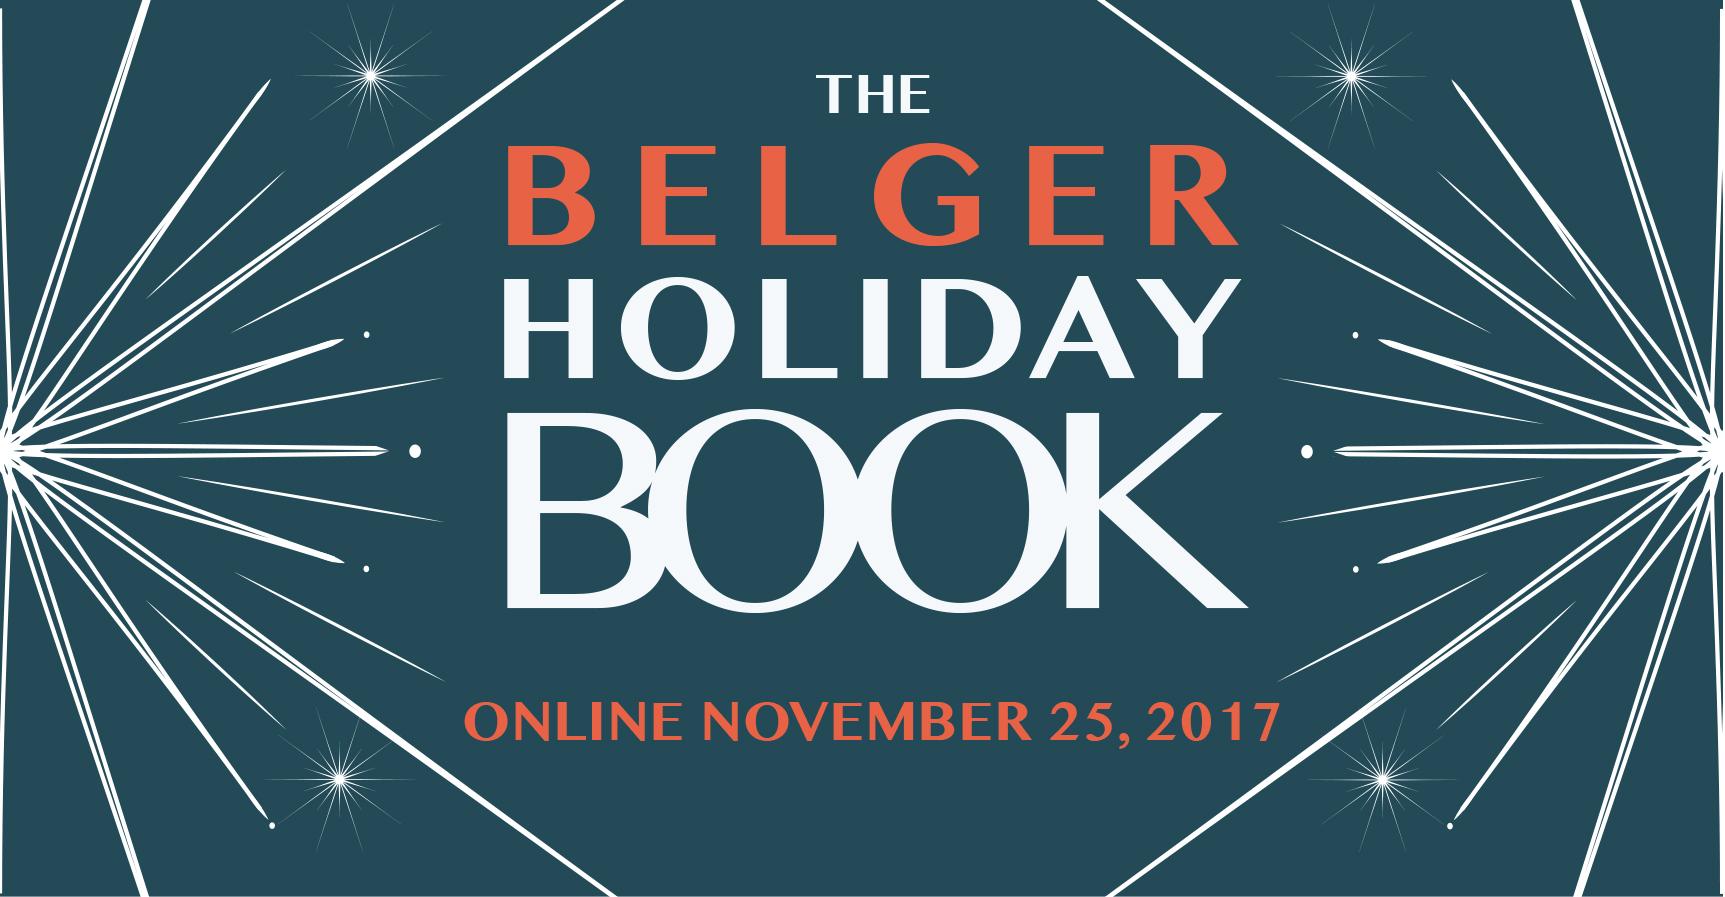 Belger Holiday Book 2017